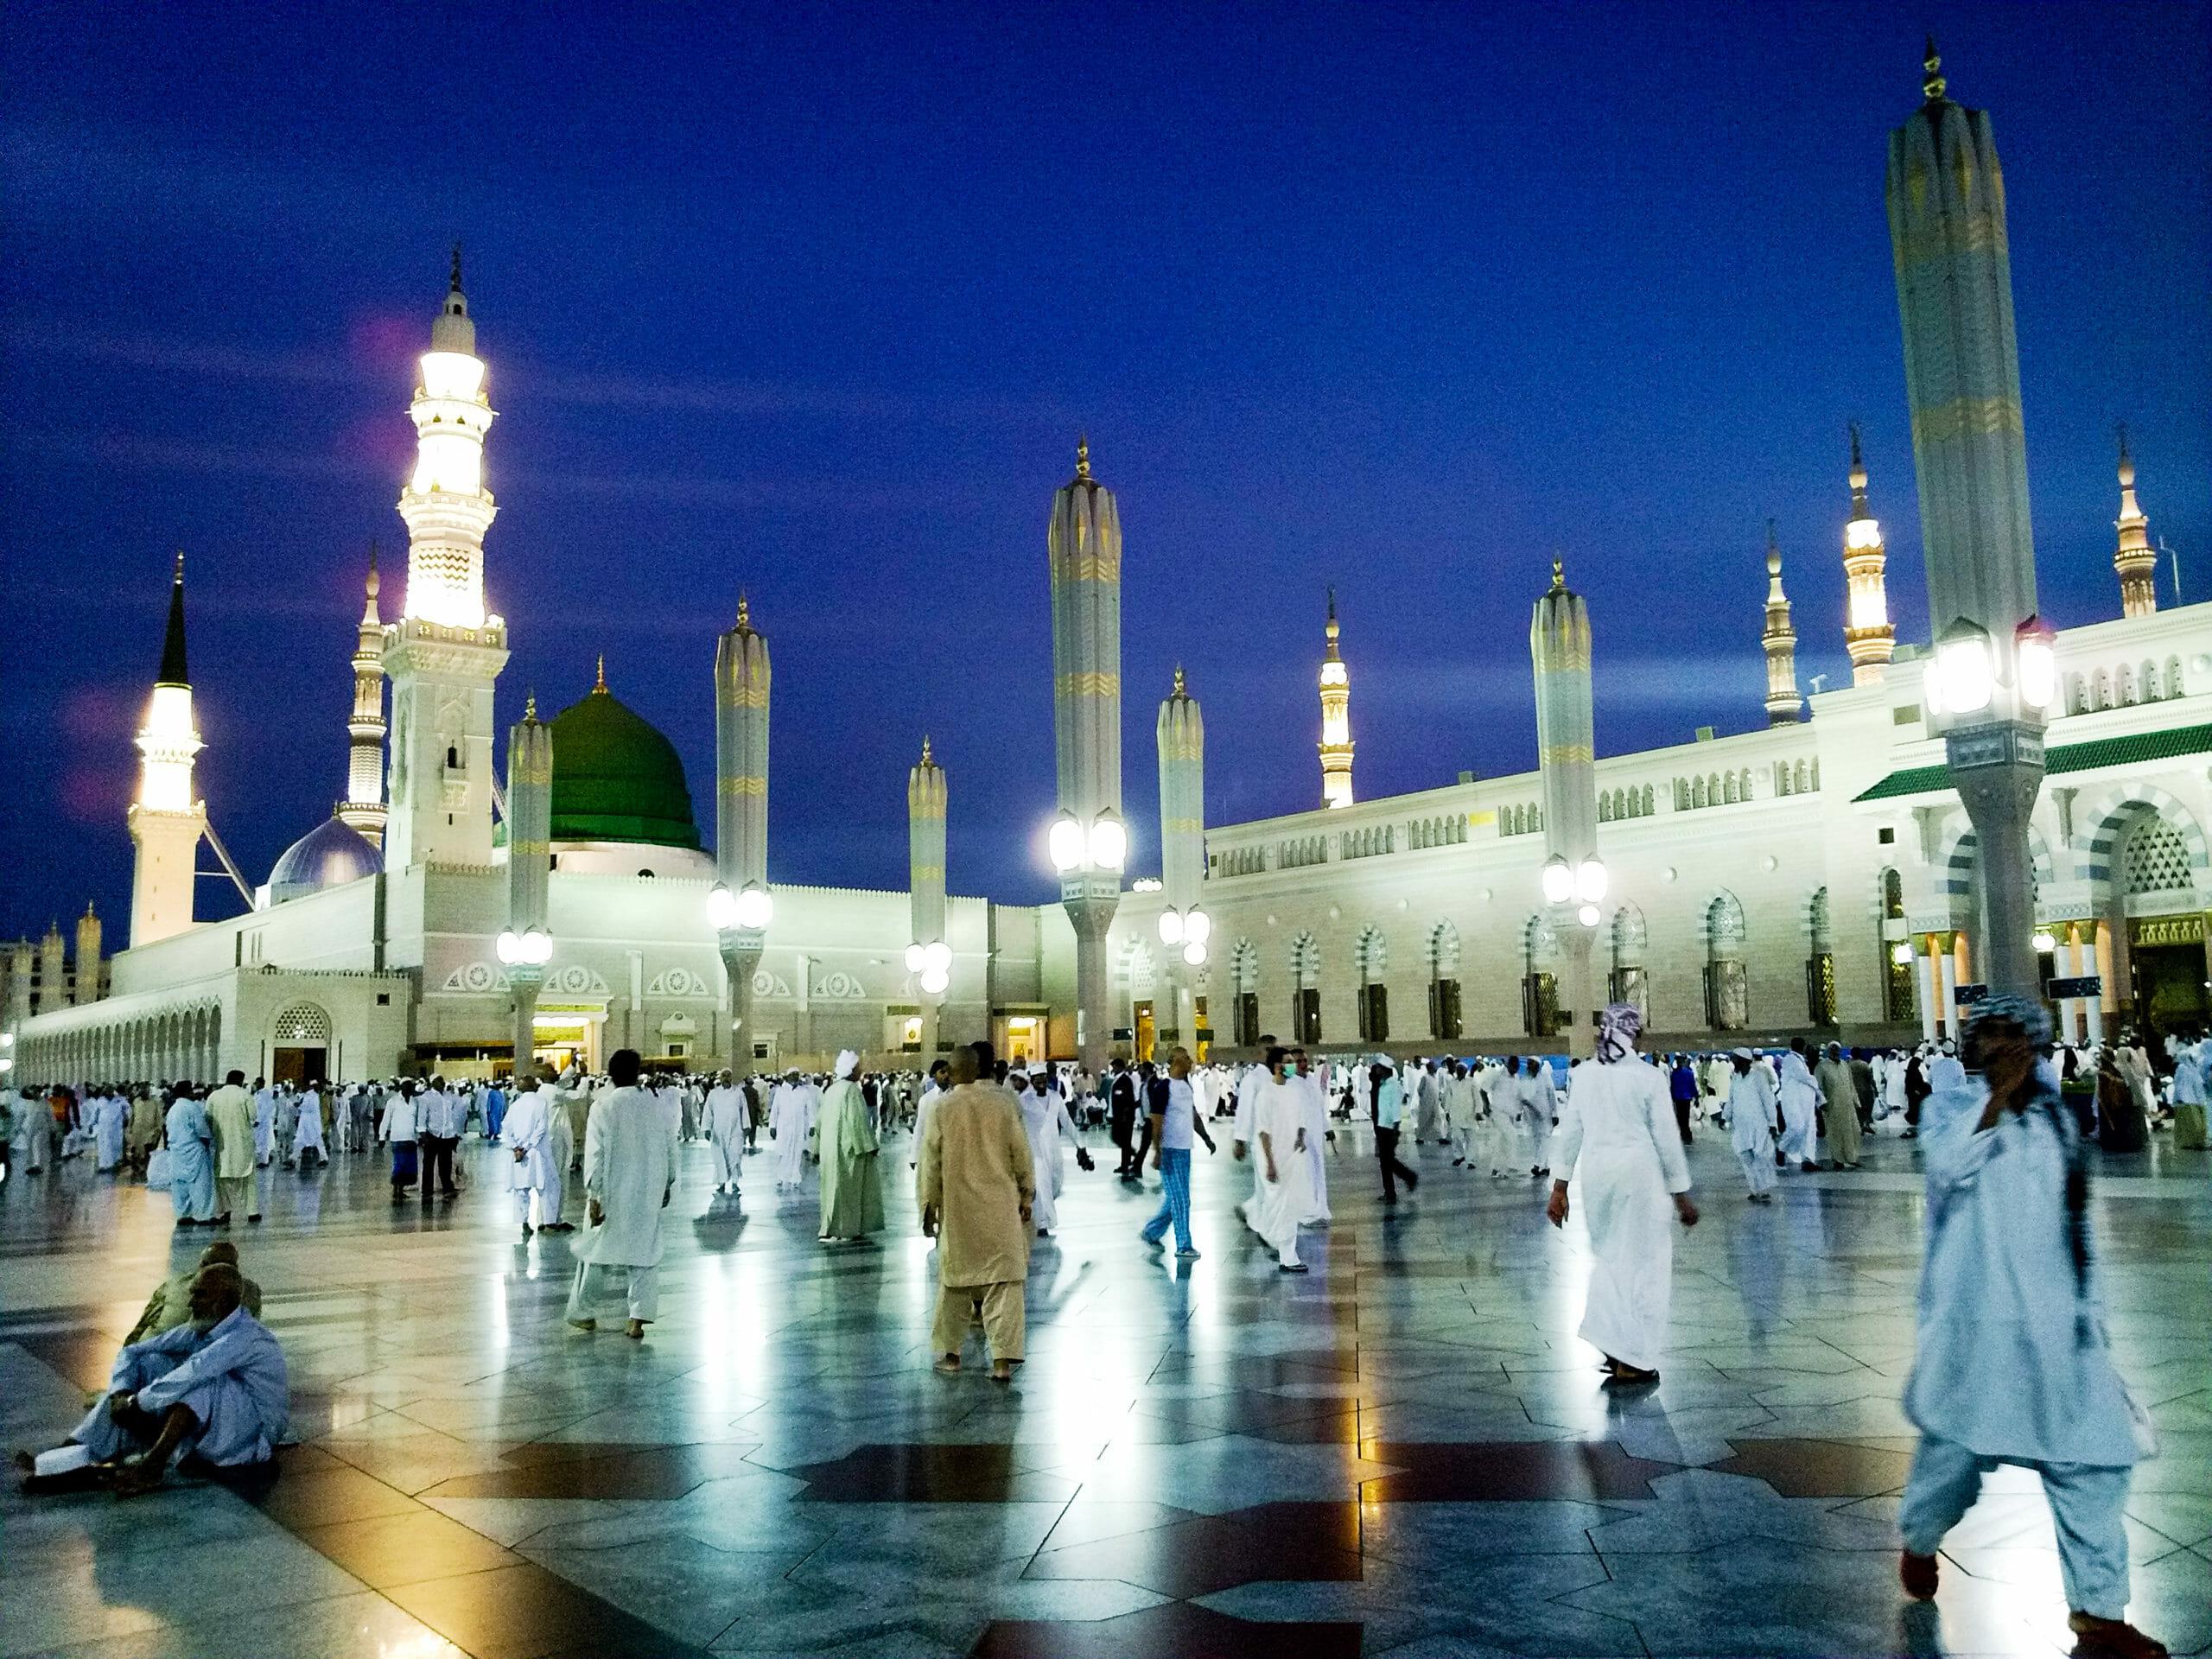 Read more about the article FAKTA: Shia, sunni og Muhammed